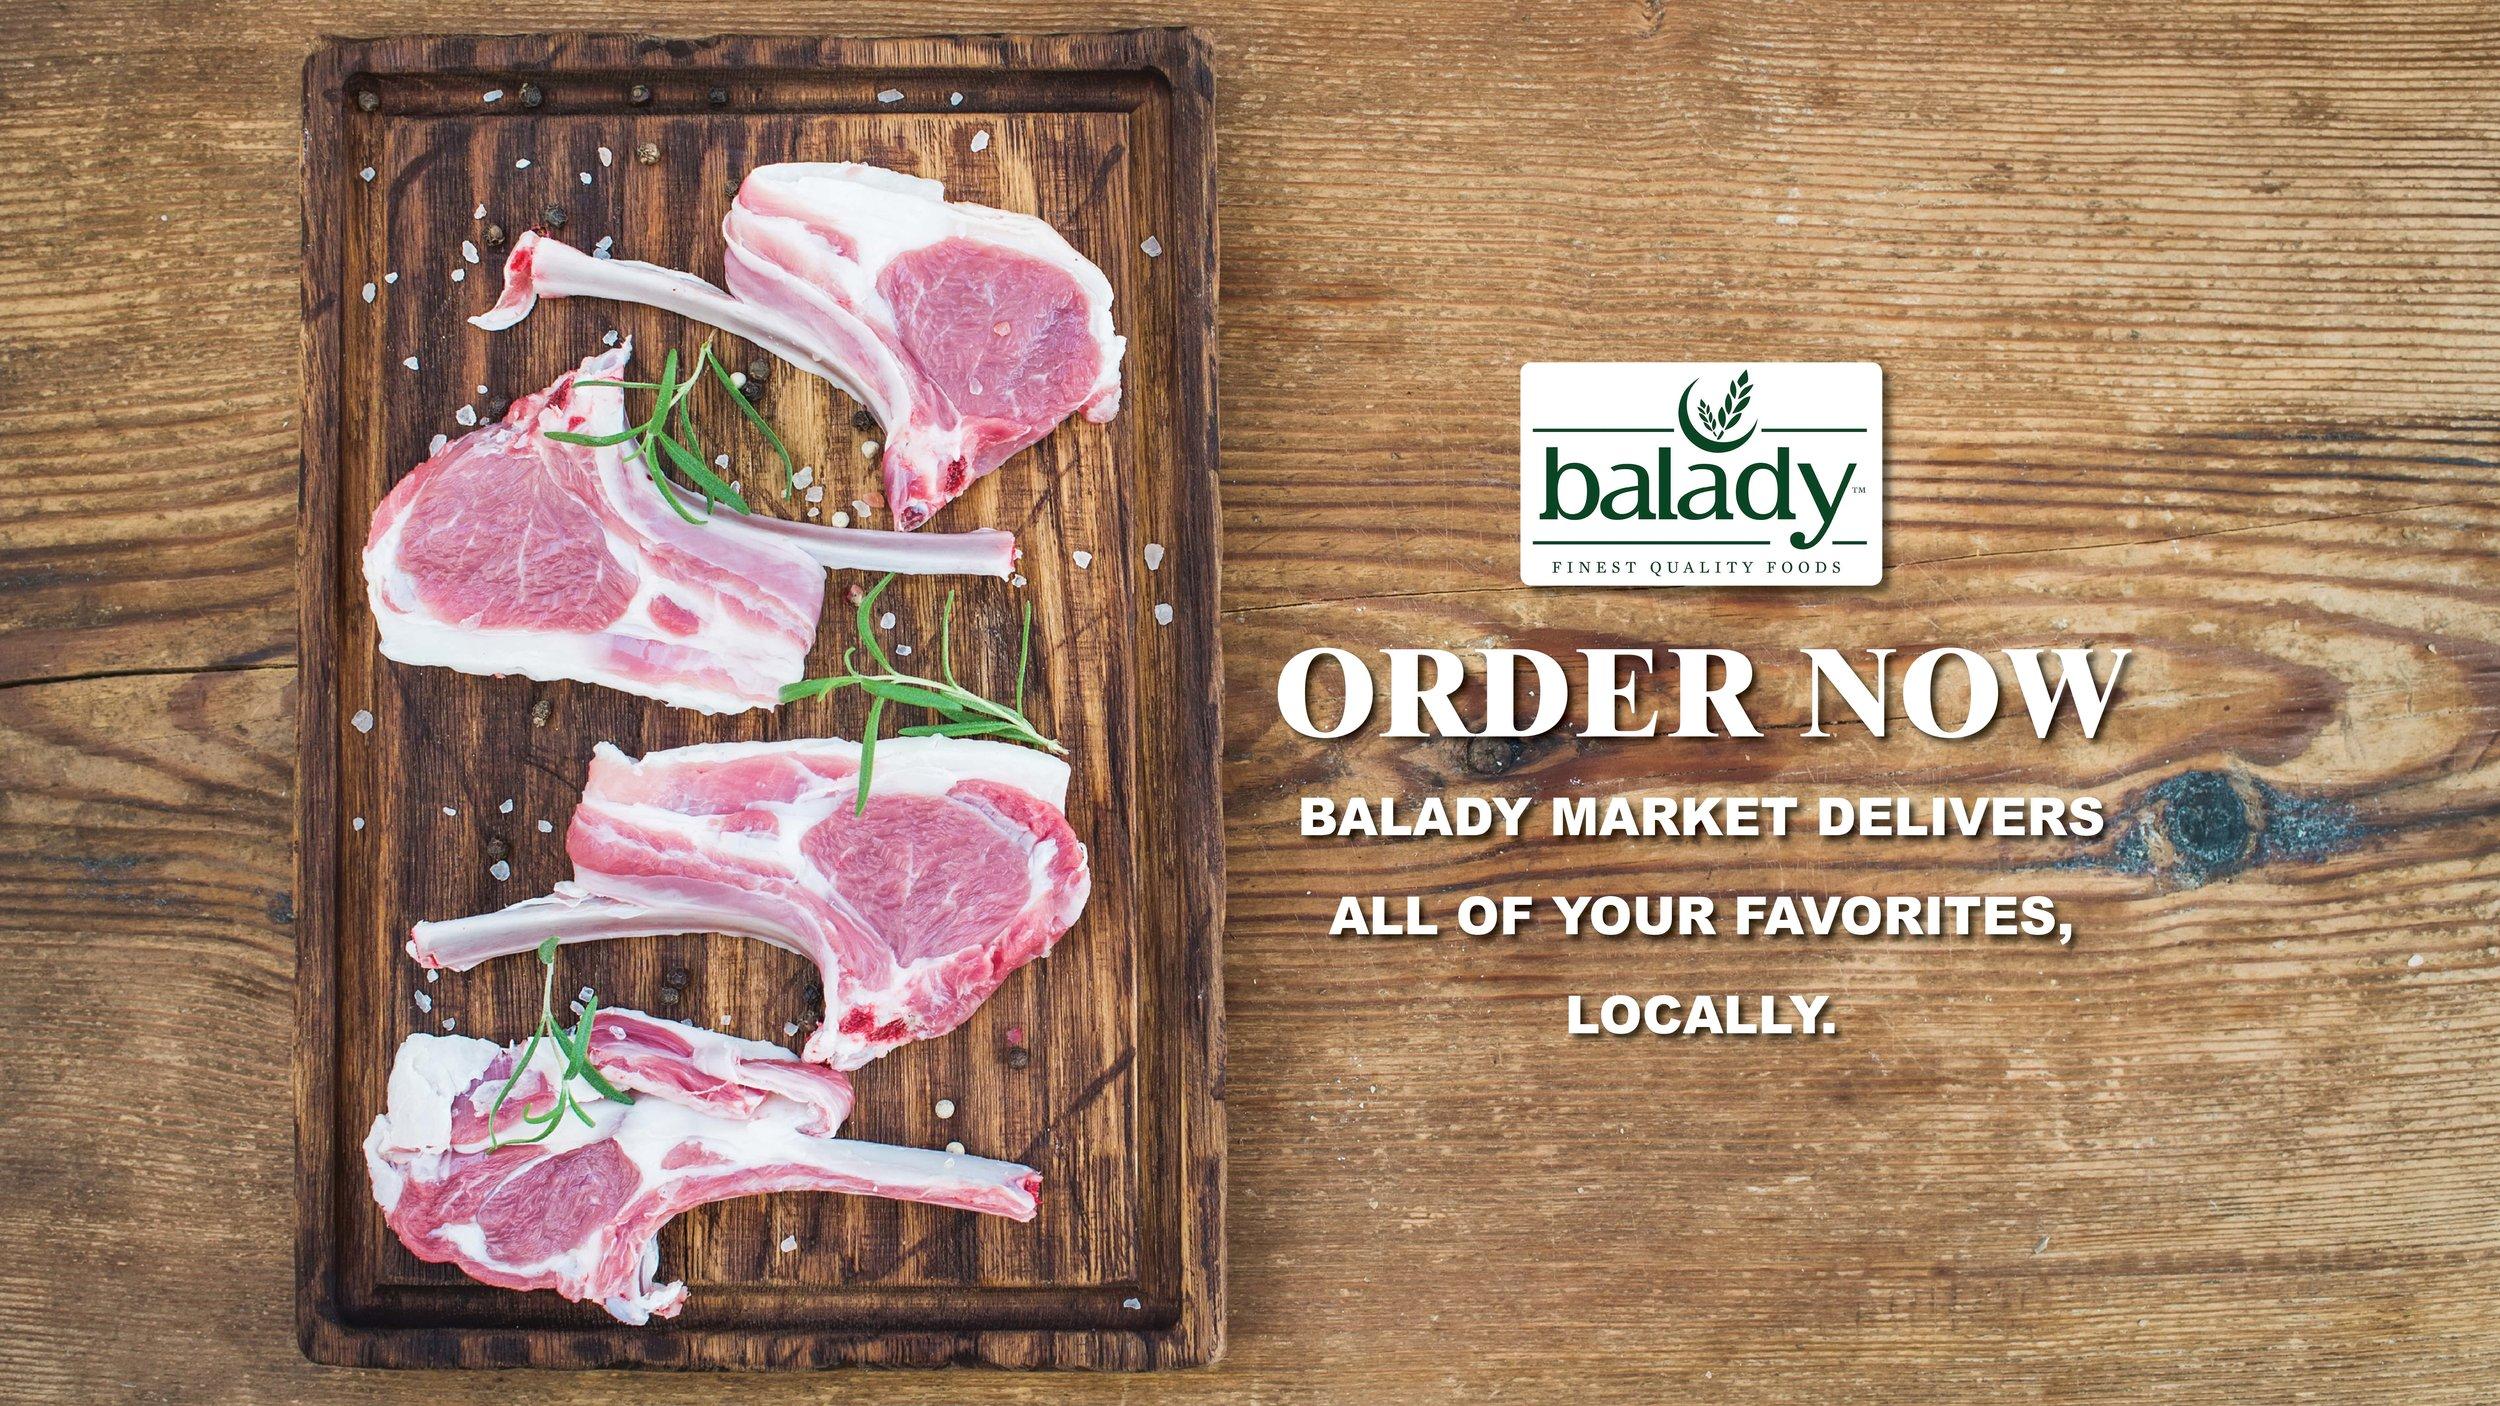 BaladyWebsliders2-min.jpg